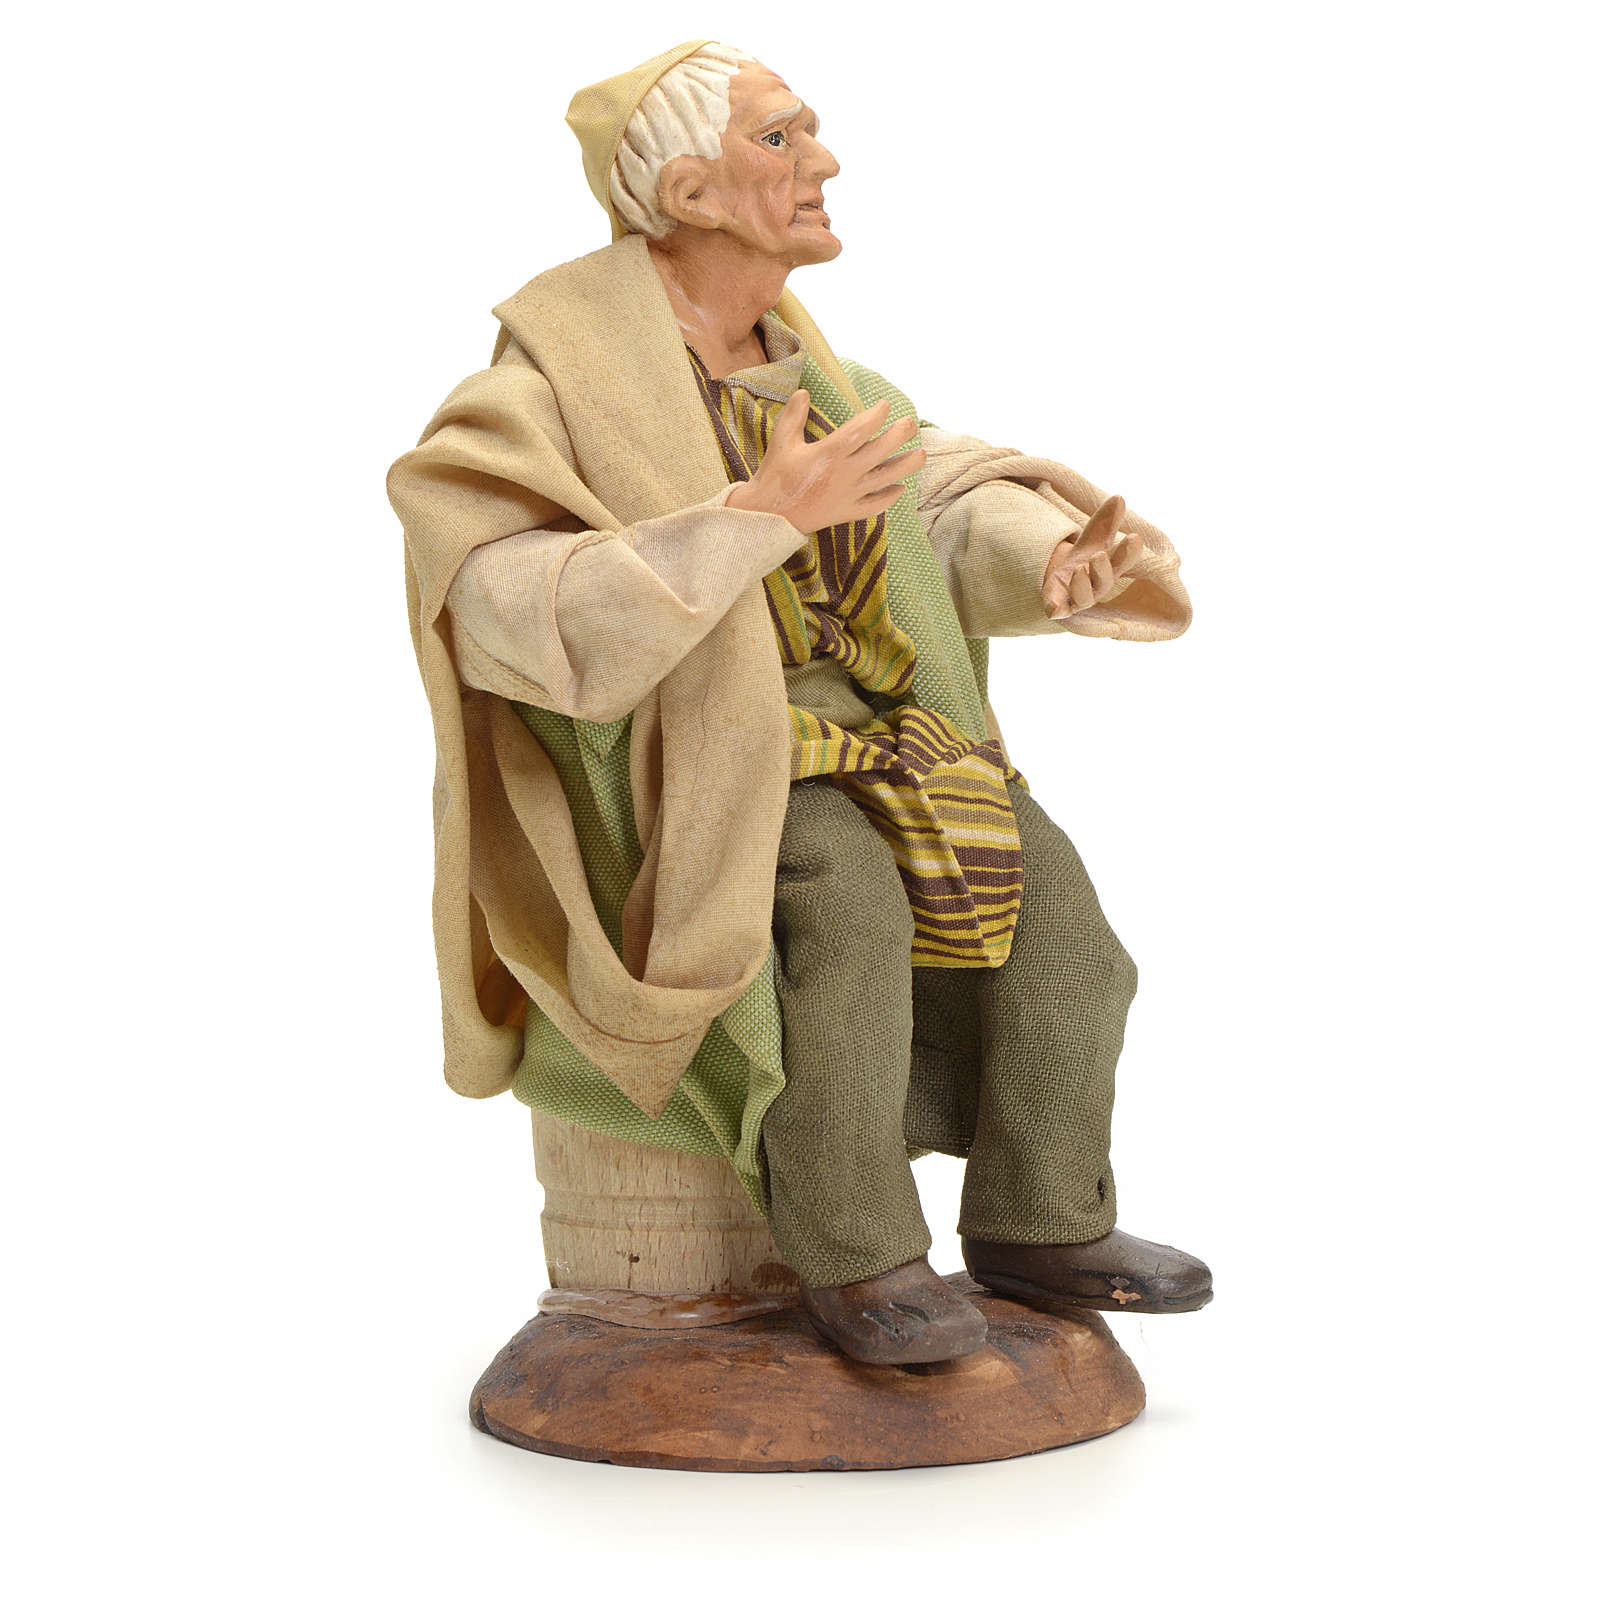 Neapolitan Nativity figurine, old man sitting, 18 cm 4